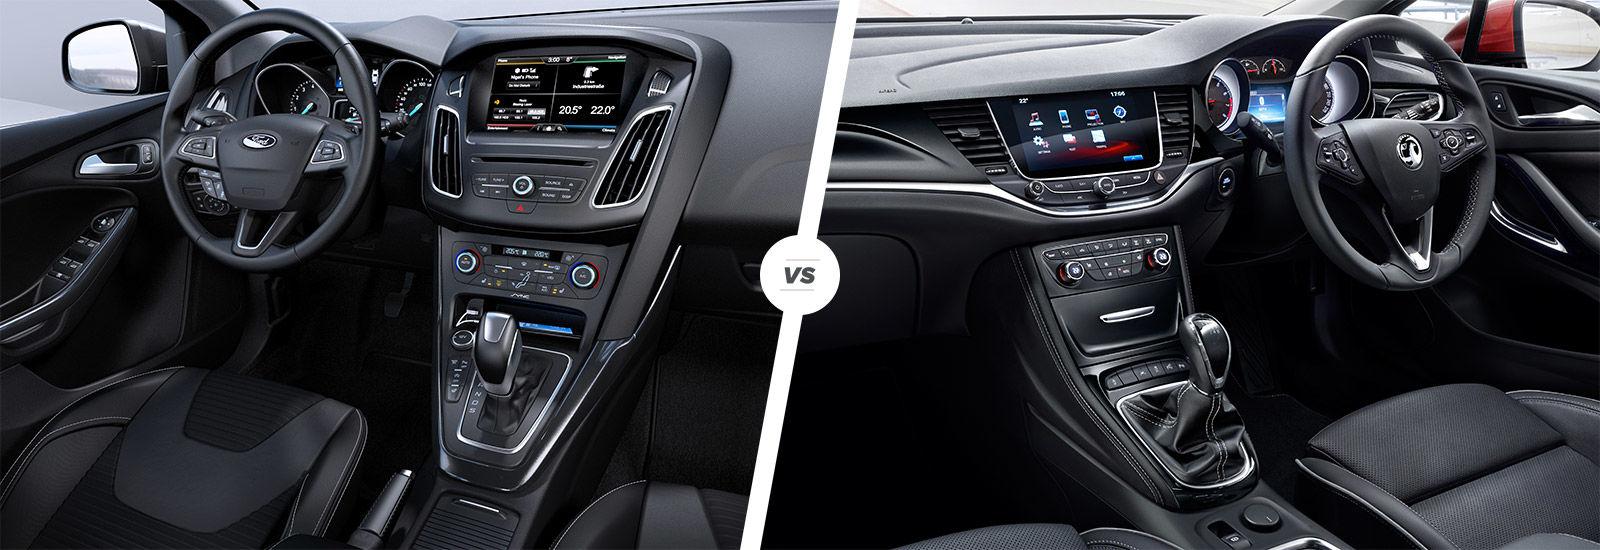 Ford Focus Vs Vauxhall Astra Interior